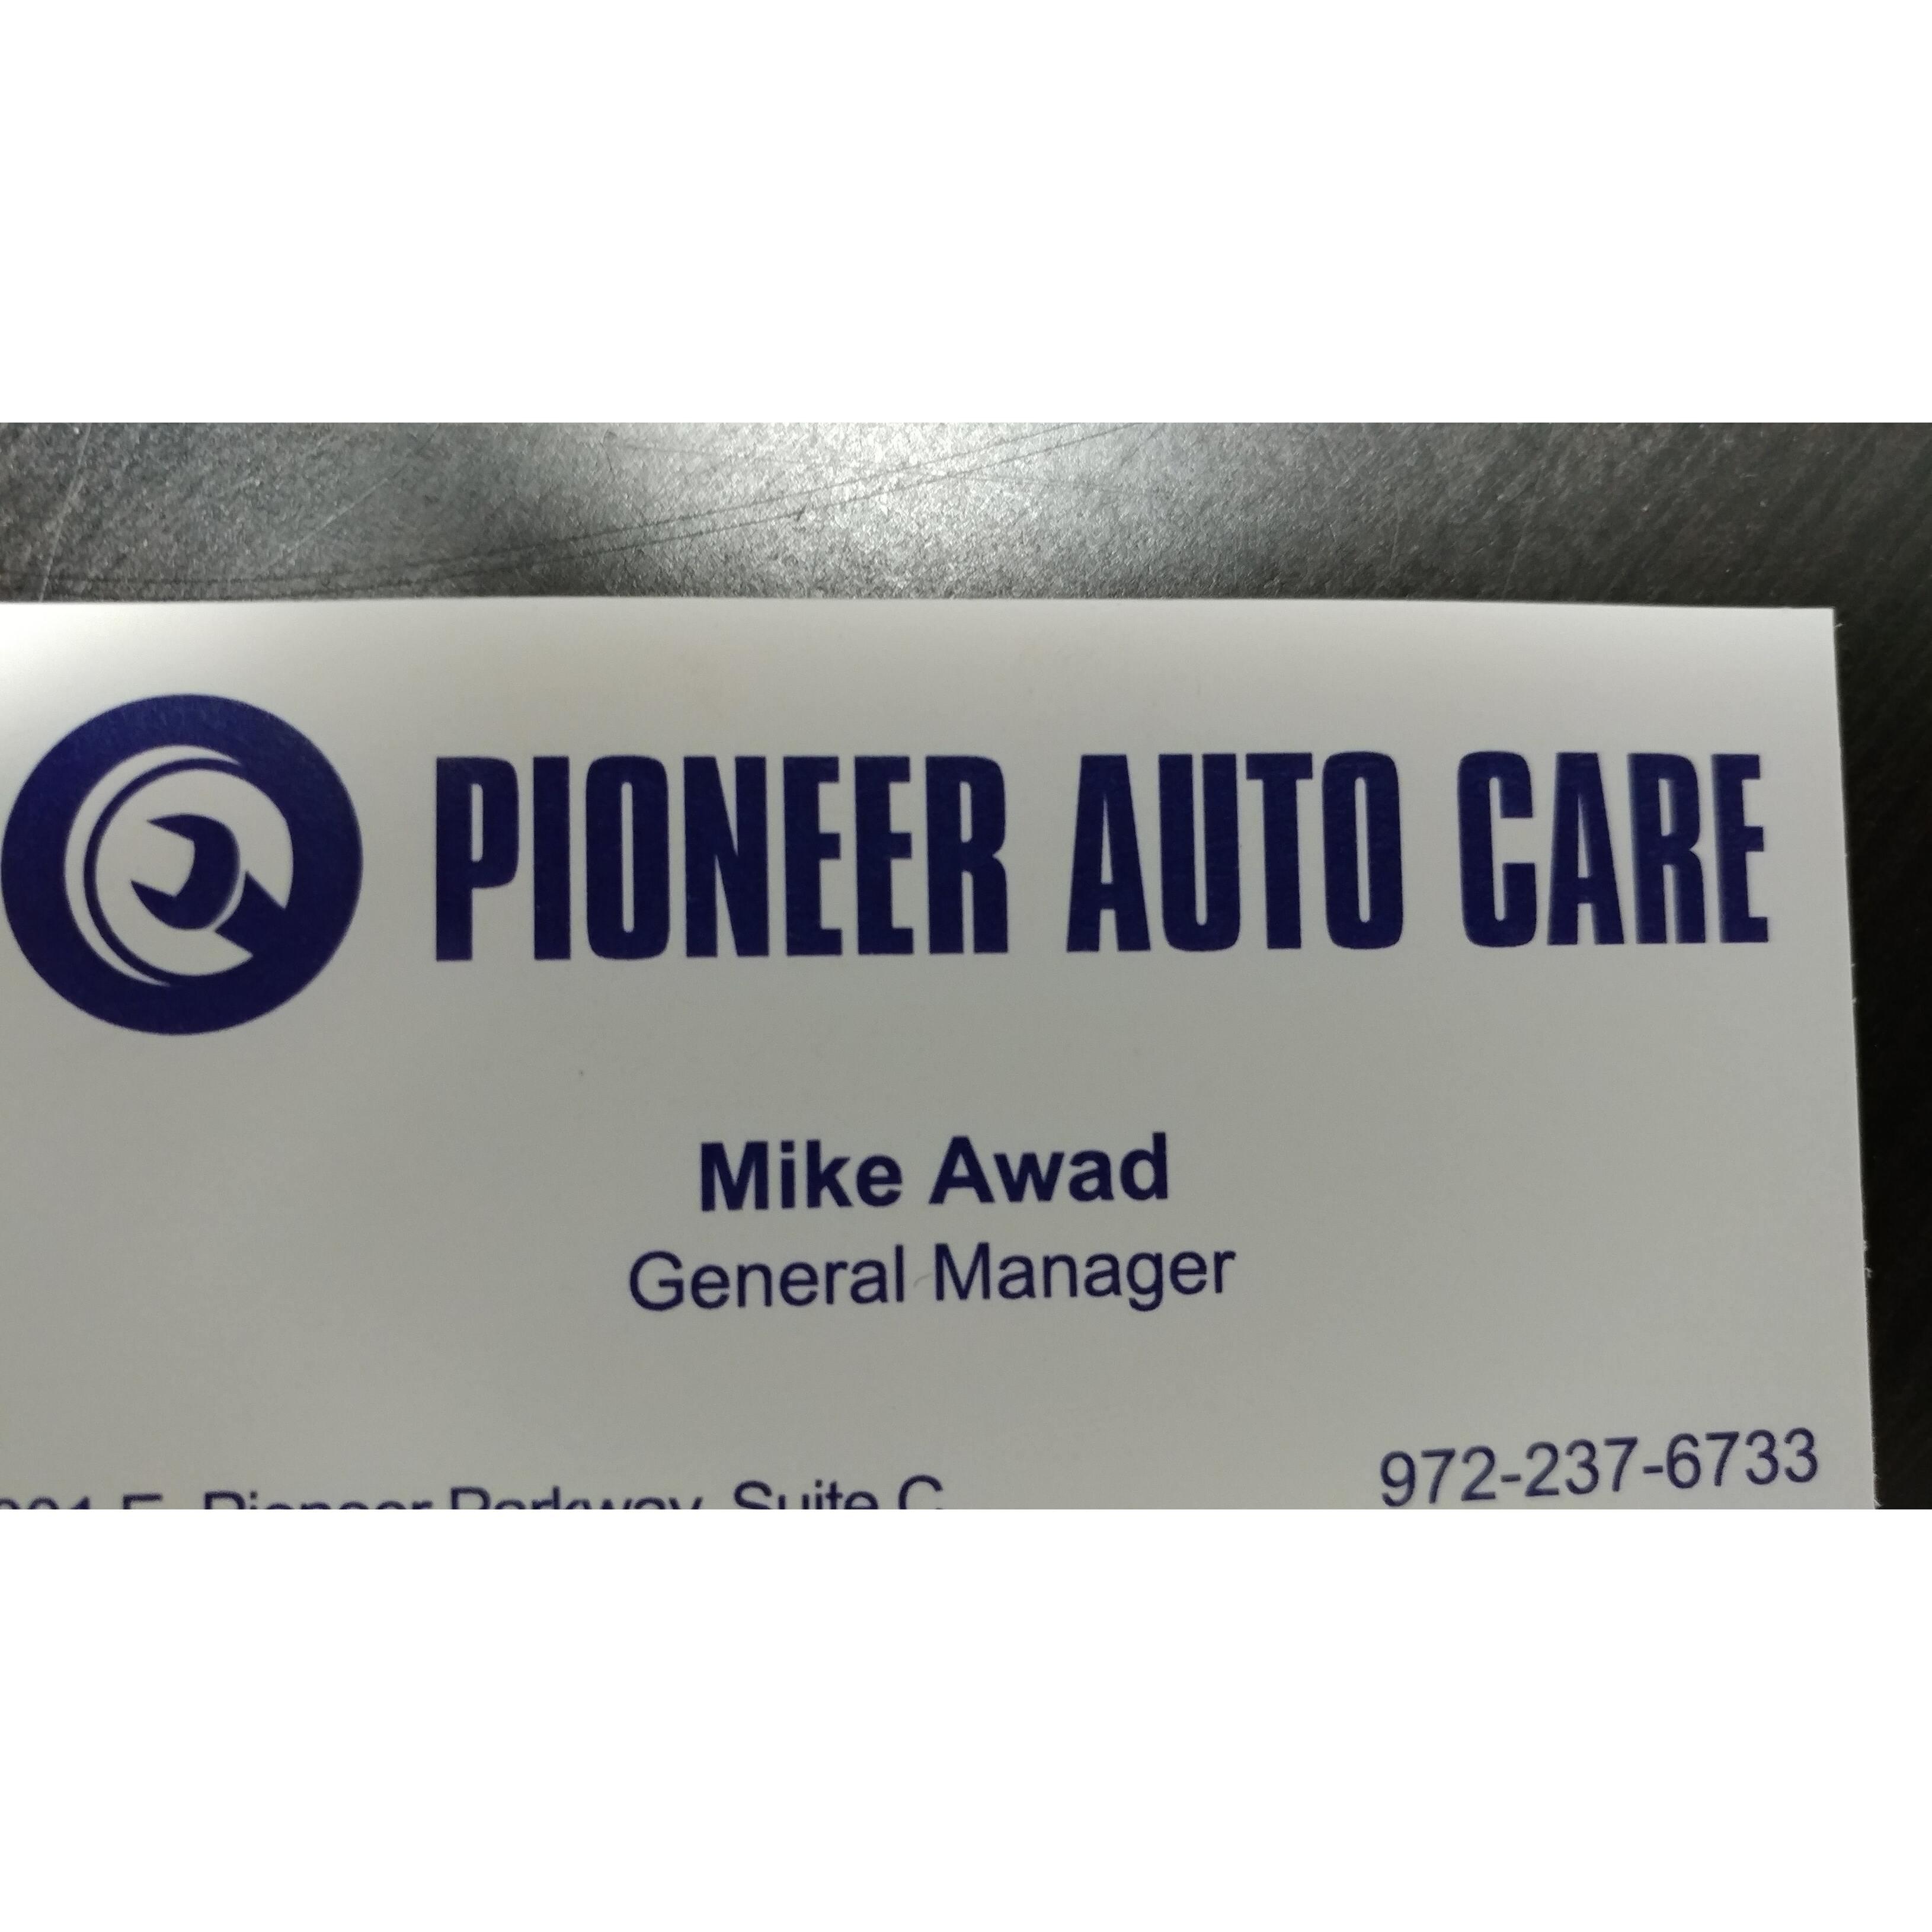 Pioneer Auto Care